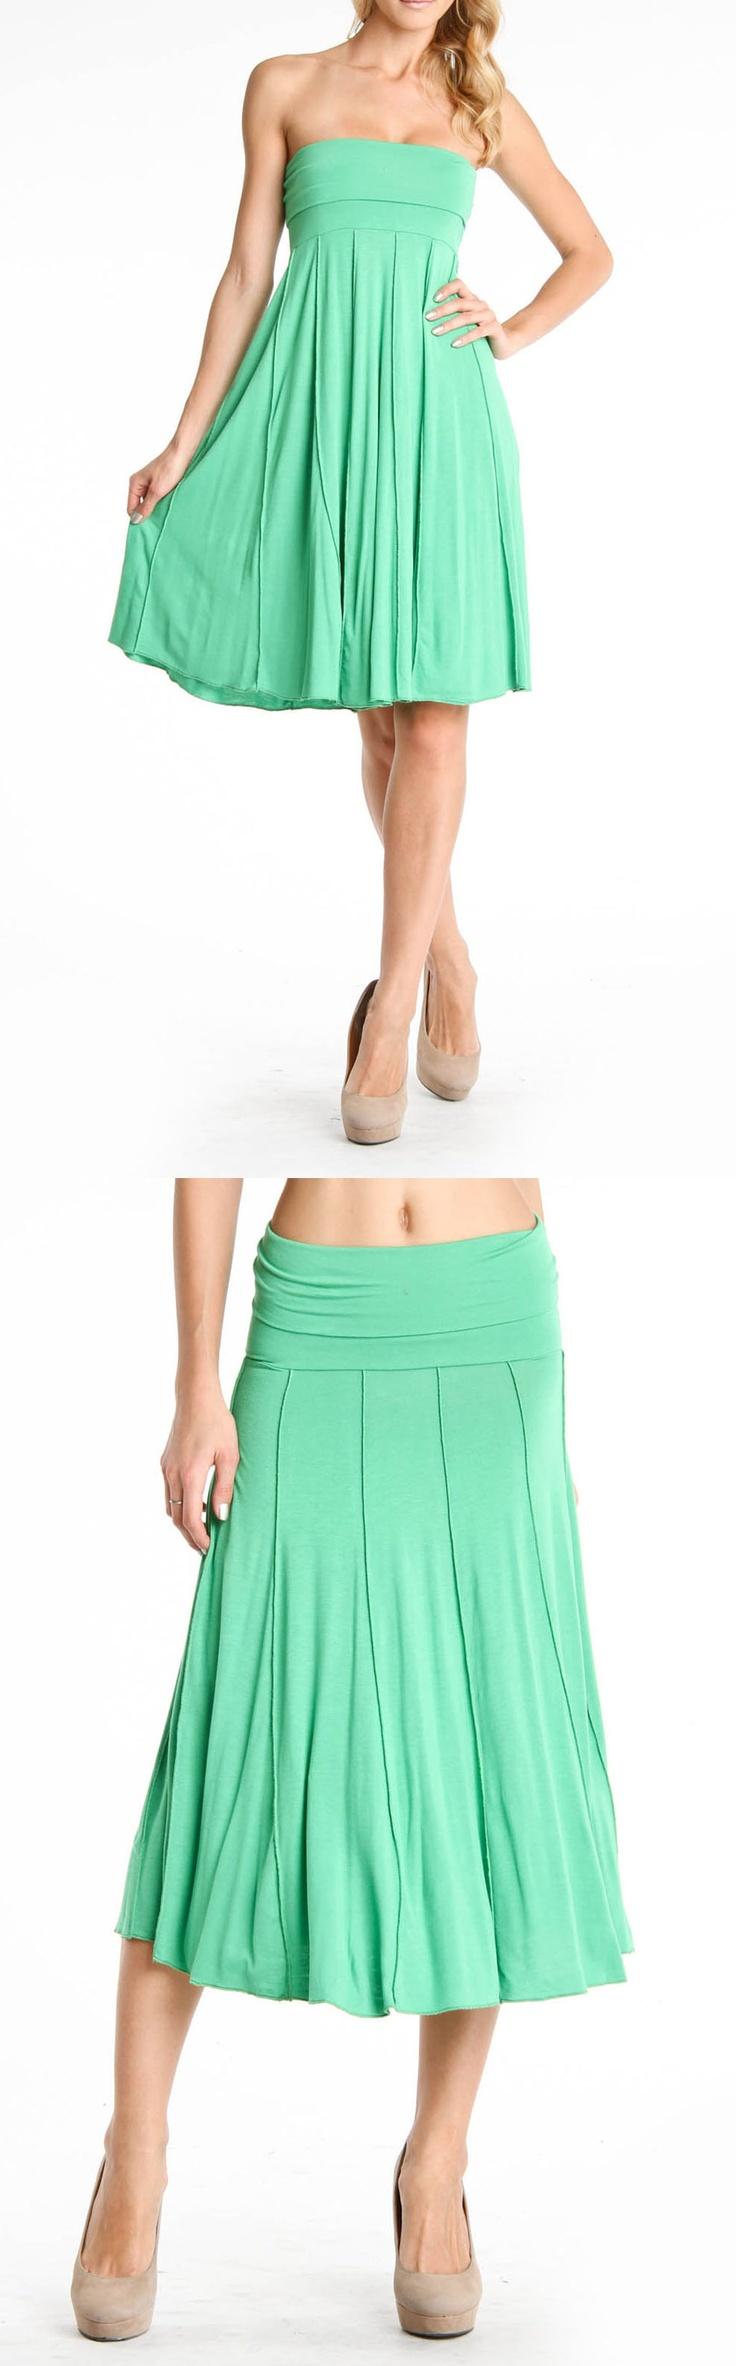 17 Best images about Convertible dress on Pinterest - Wrap dresses ...